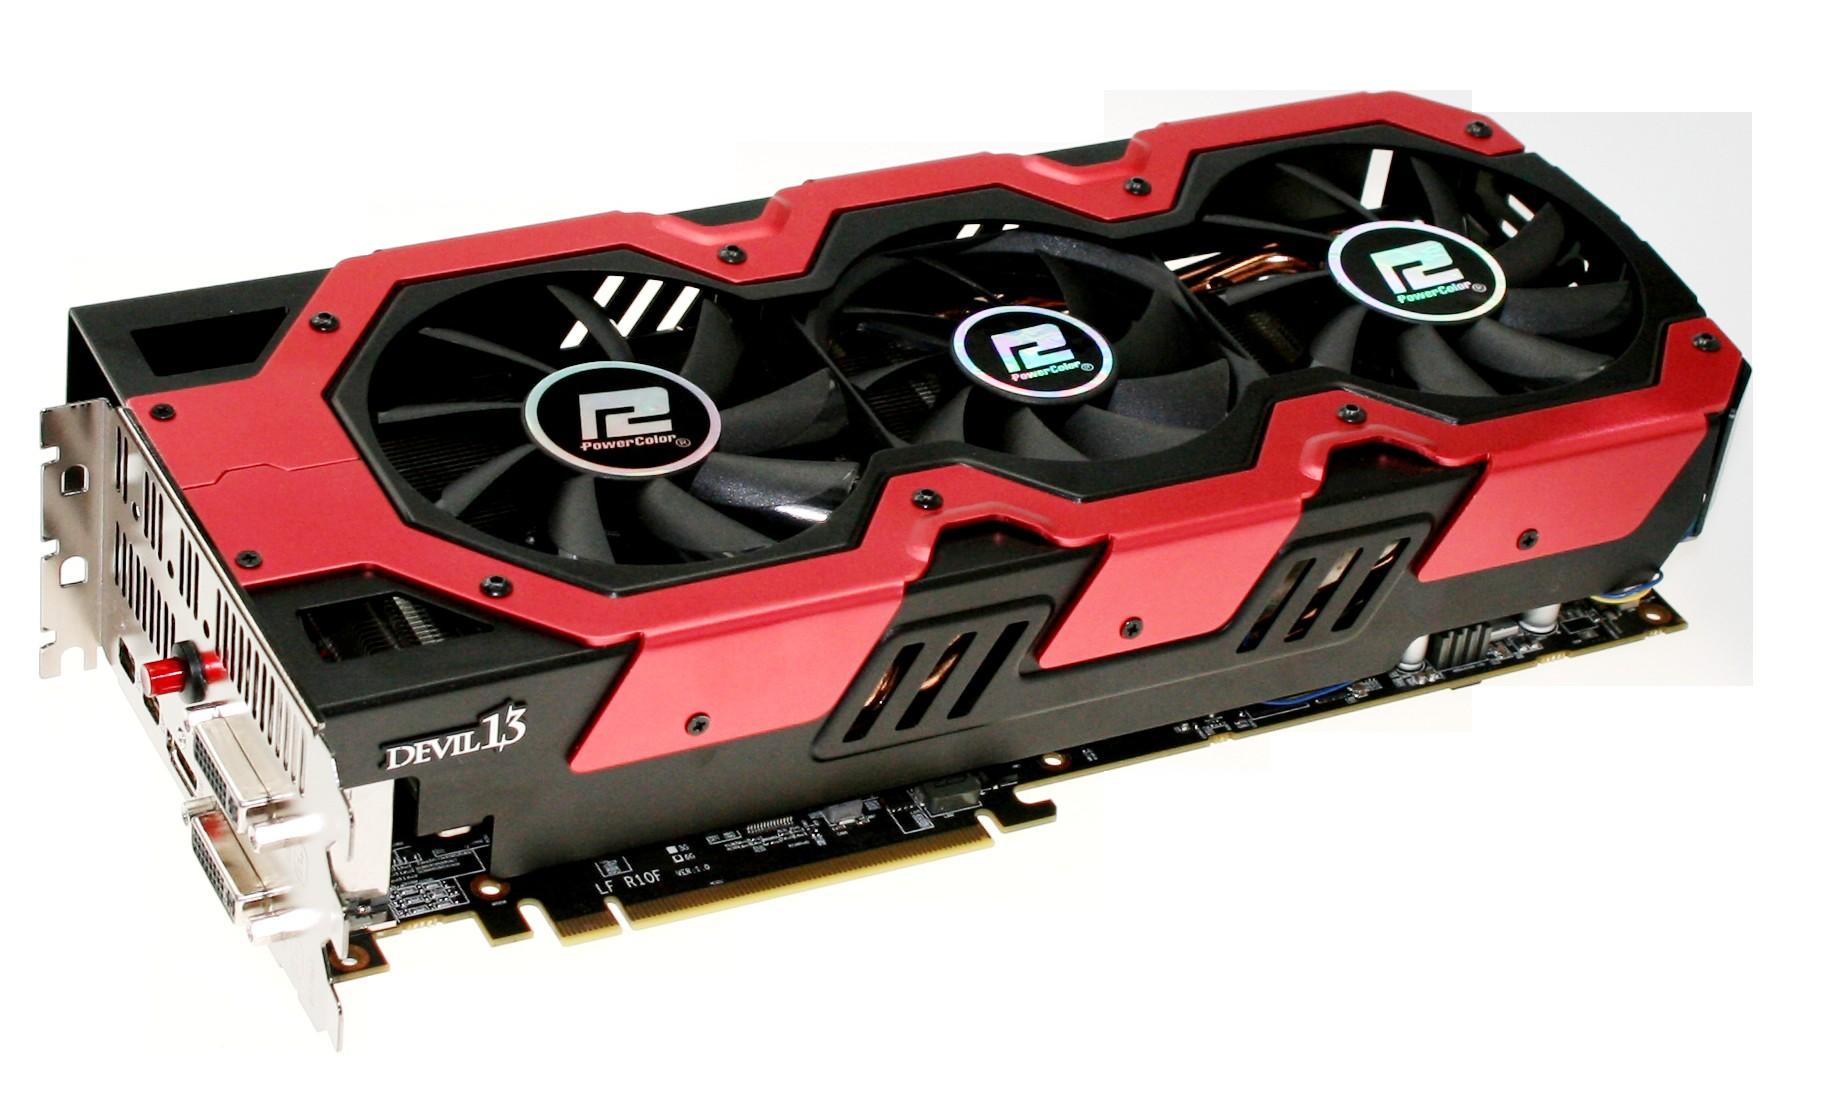 Powercolor Devil 13 HD7990: Grafikkarte mit zwei Tahiti-XT-GPUs bald erhältlich -